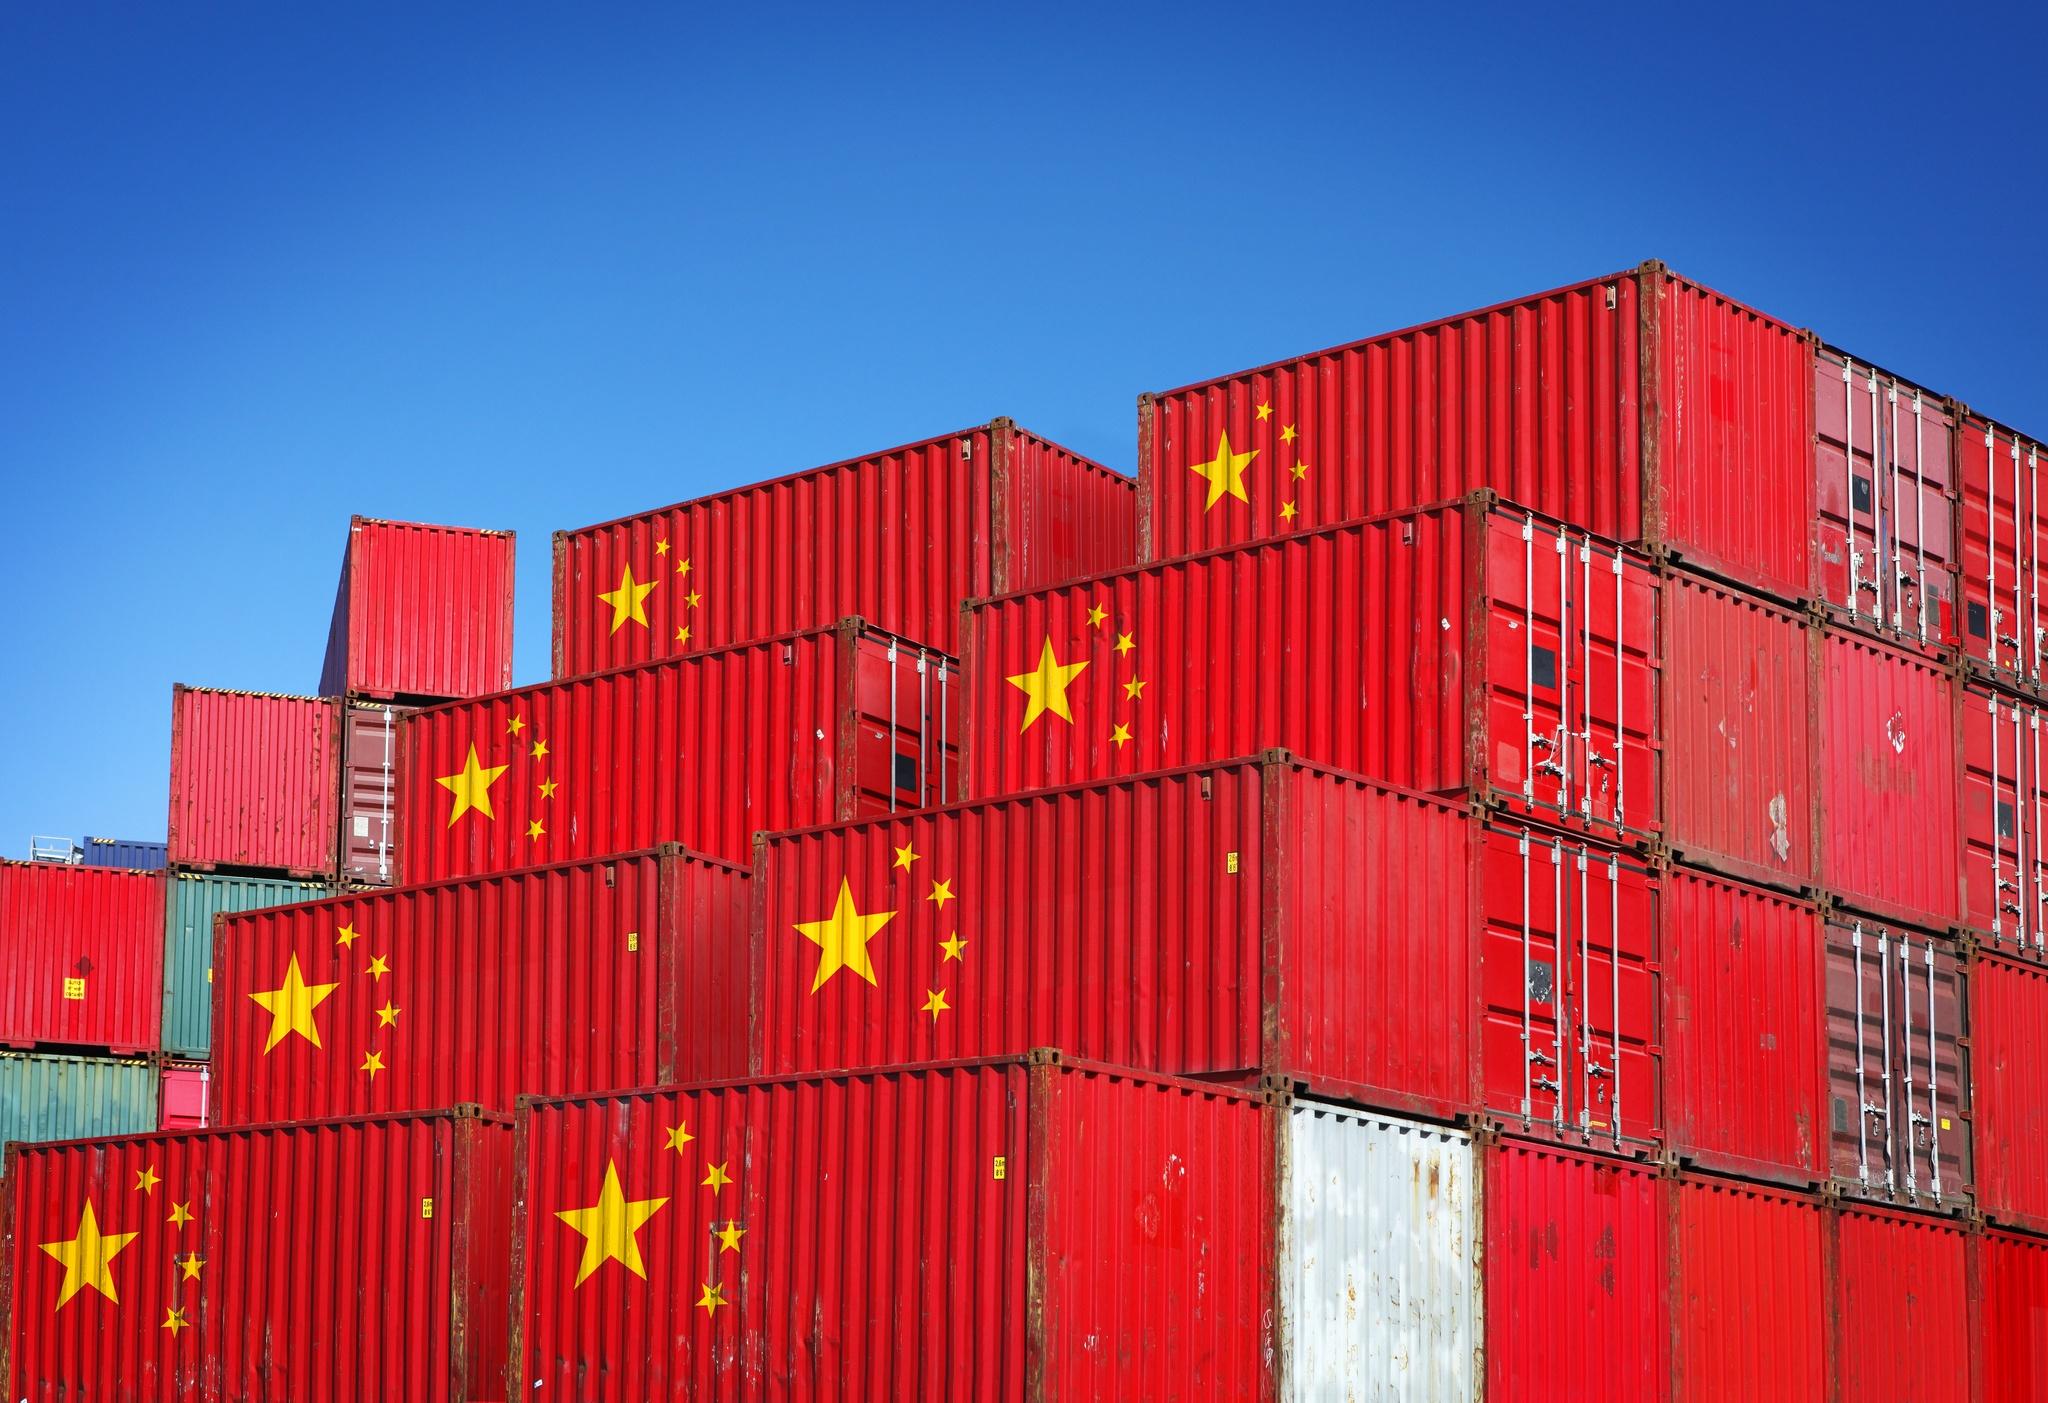 Logistics companies, Asian nations reap benefits of trade war